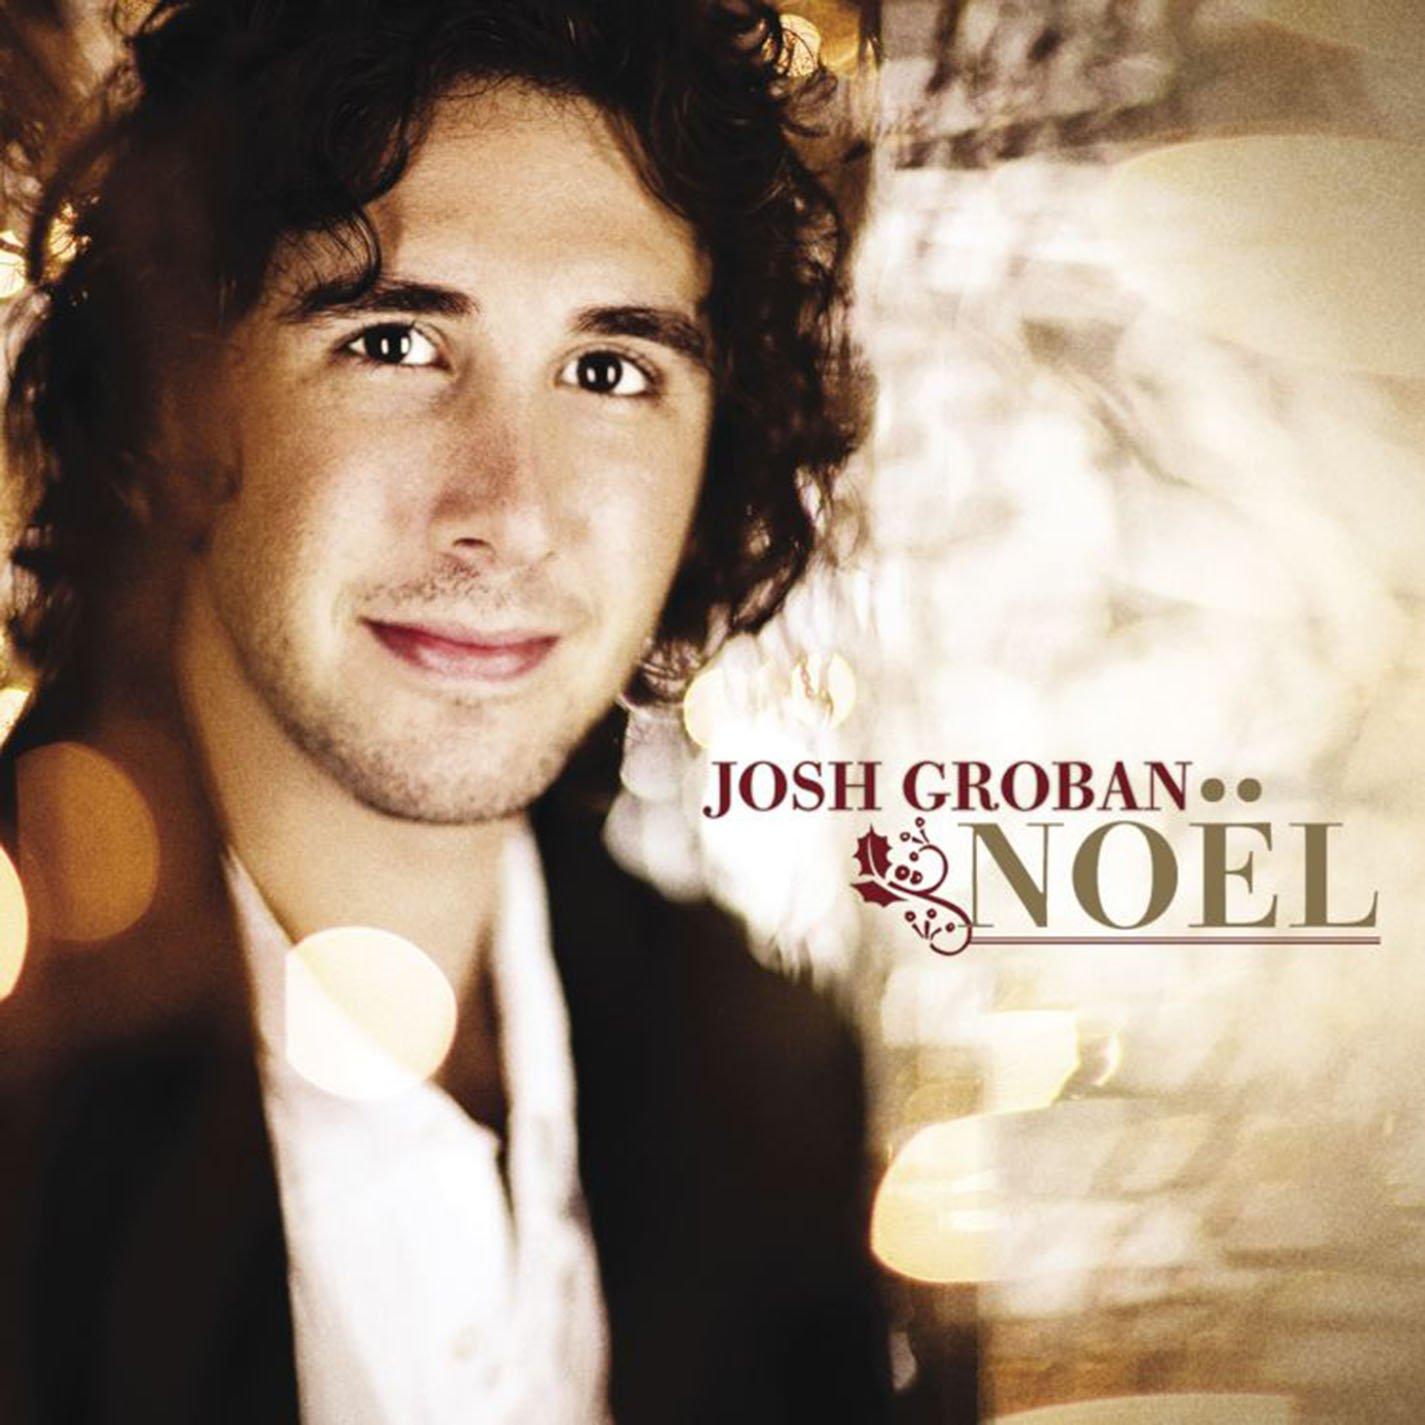 Josh Groban – Noel (2007) [FLAC]